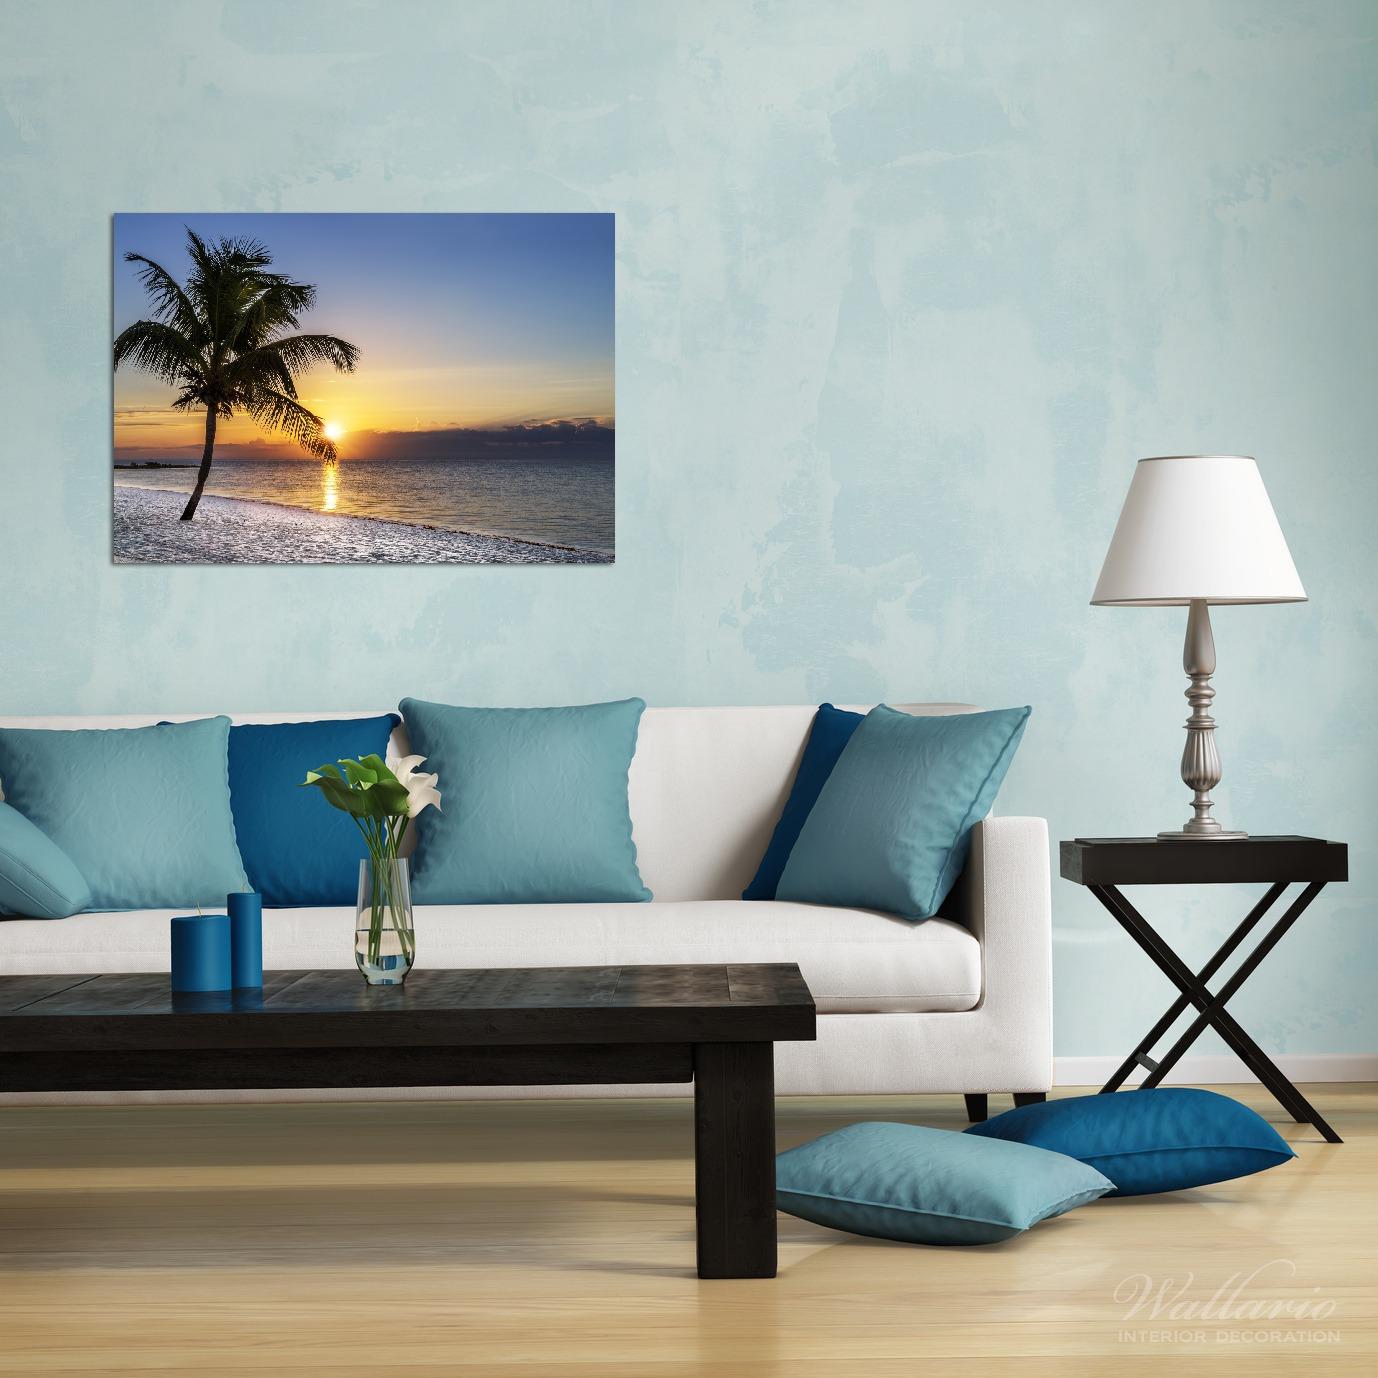 Wandbild Palme am Strand - Sonnenuntergang über dem Meer – Bild 2